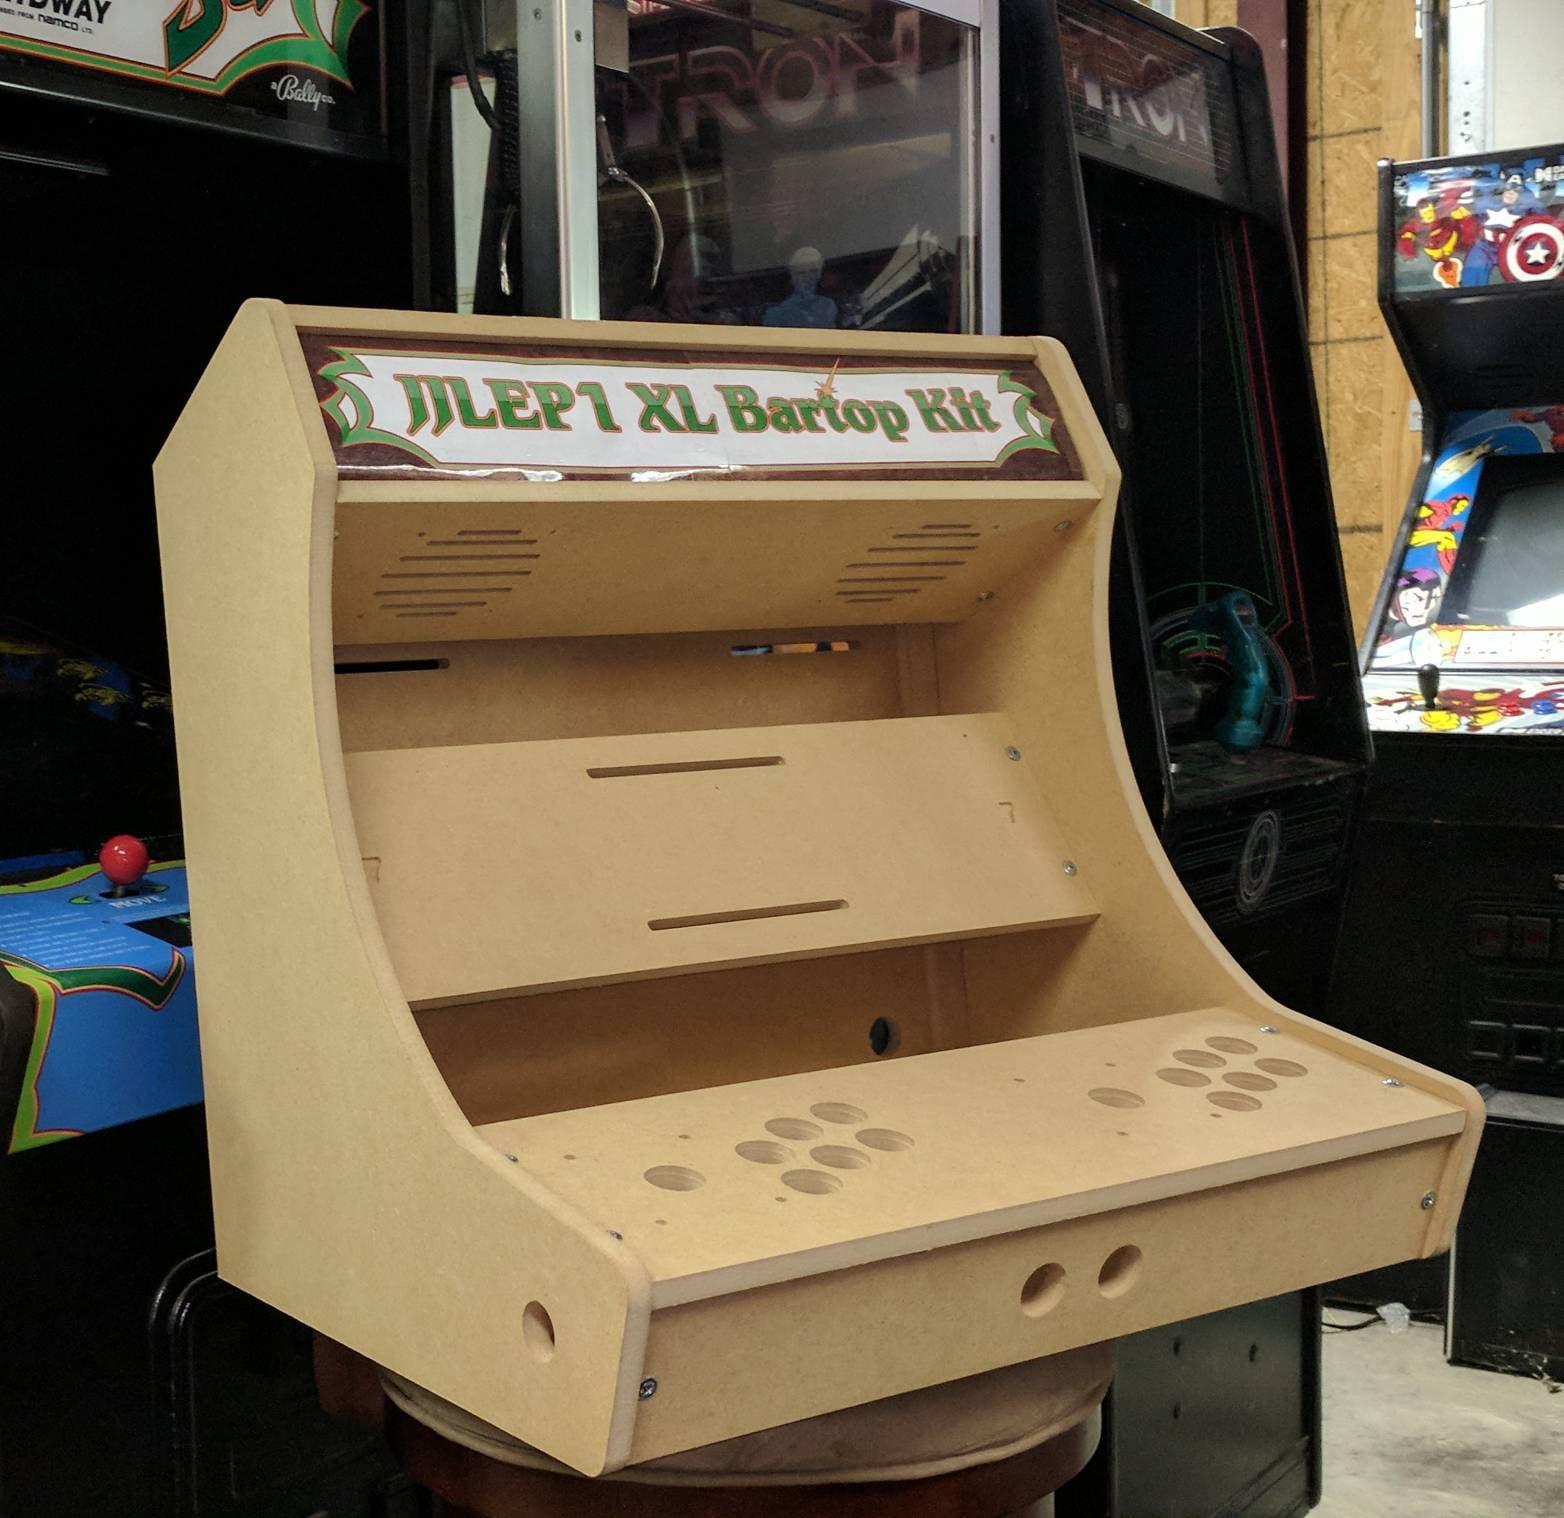 2 player xl bartop tabletop arcade cabinet diy kit w. Black Bedroom Furniture Sets. Home Design Ideas